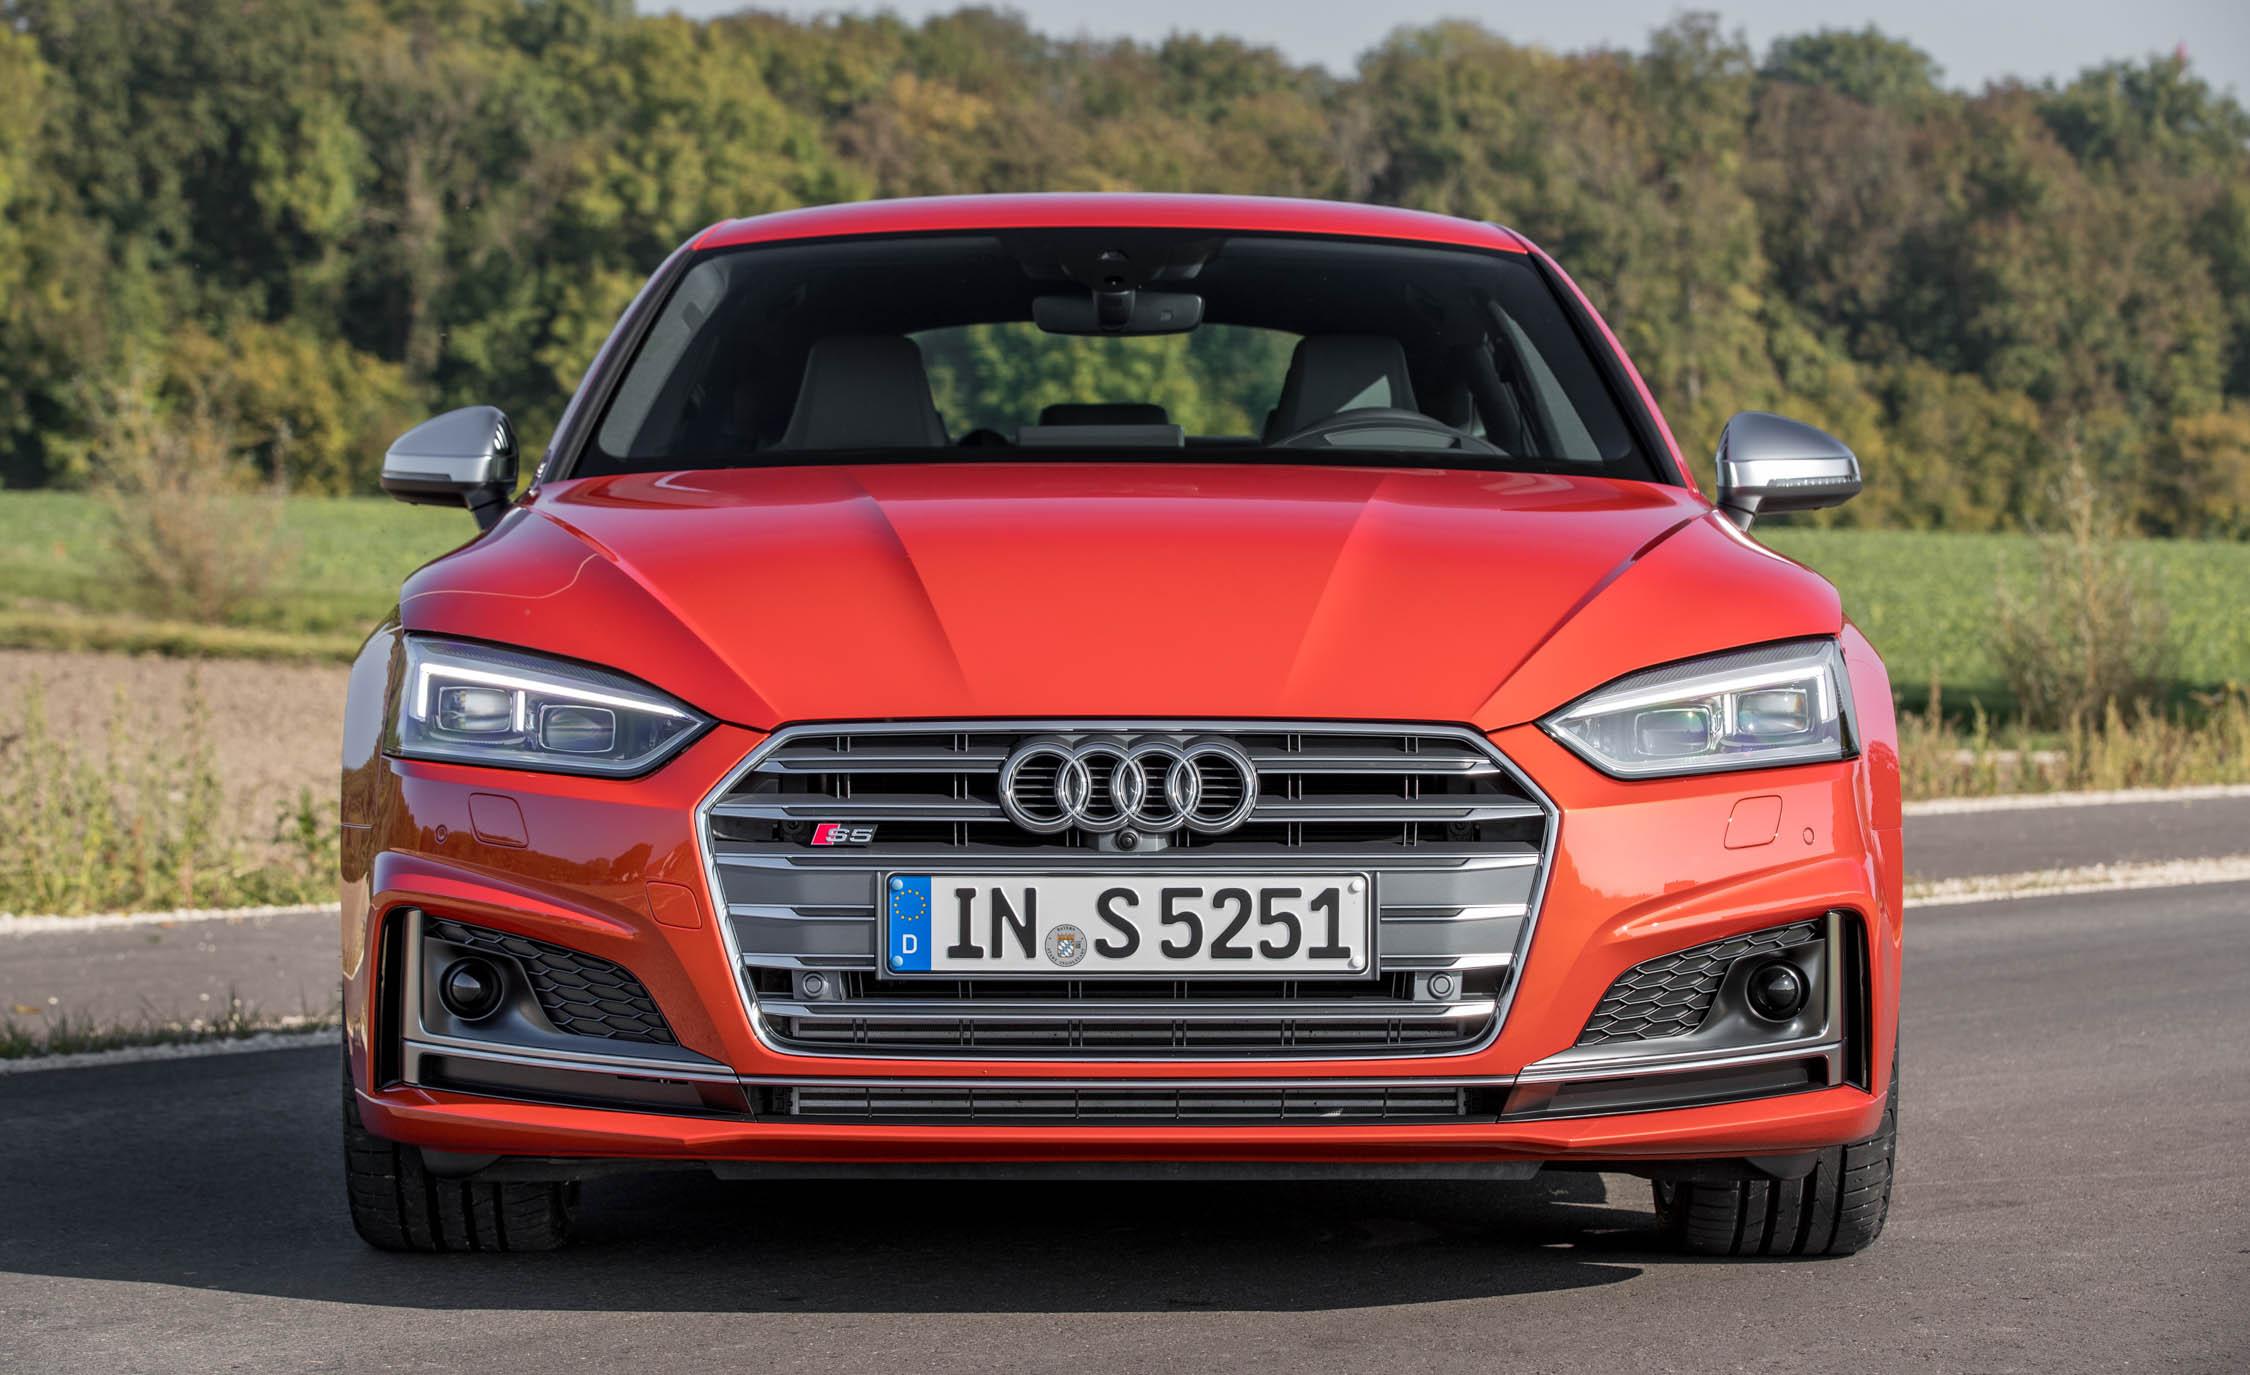 2017 Audi S5 Sportback (View 10 of 10)